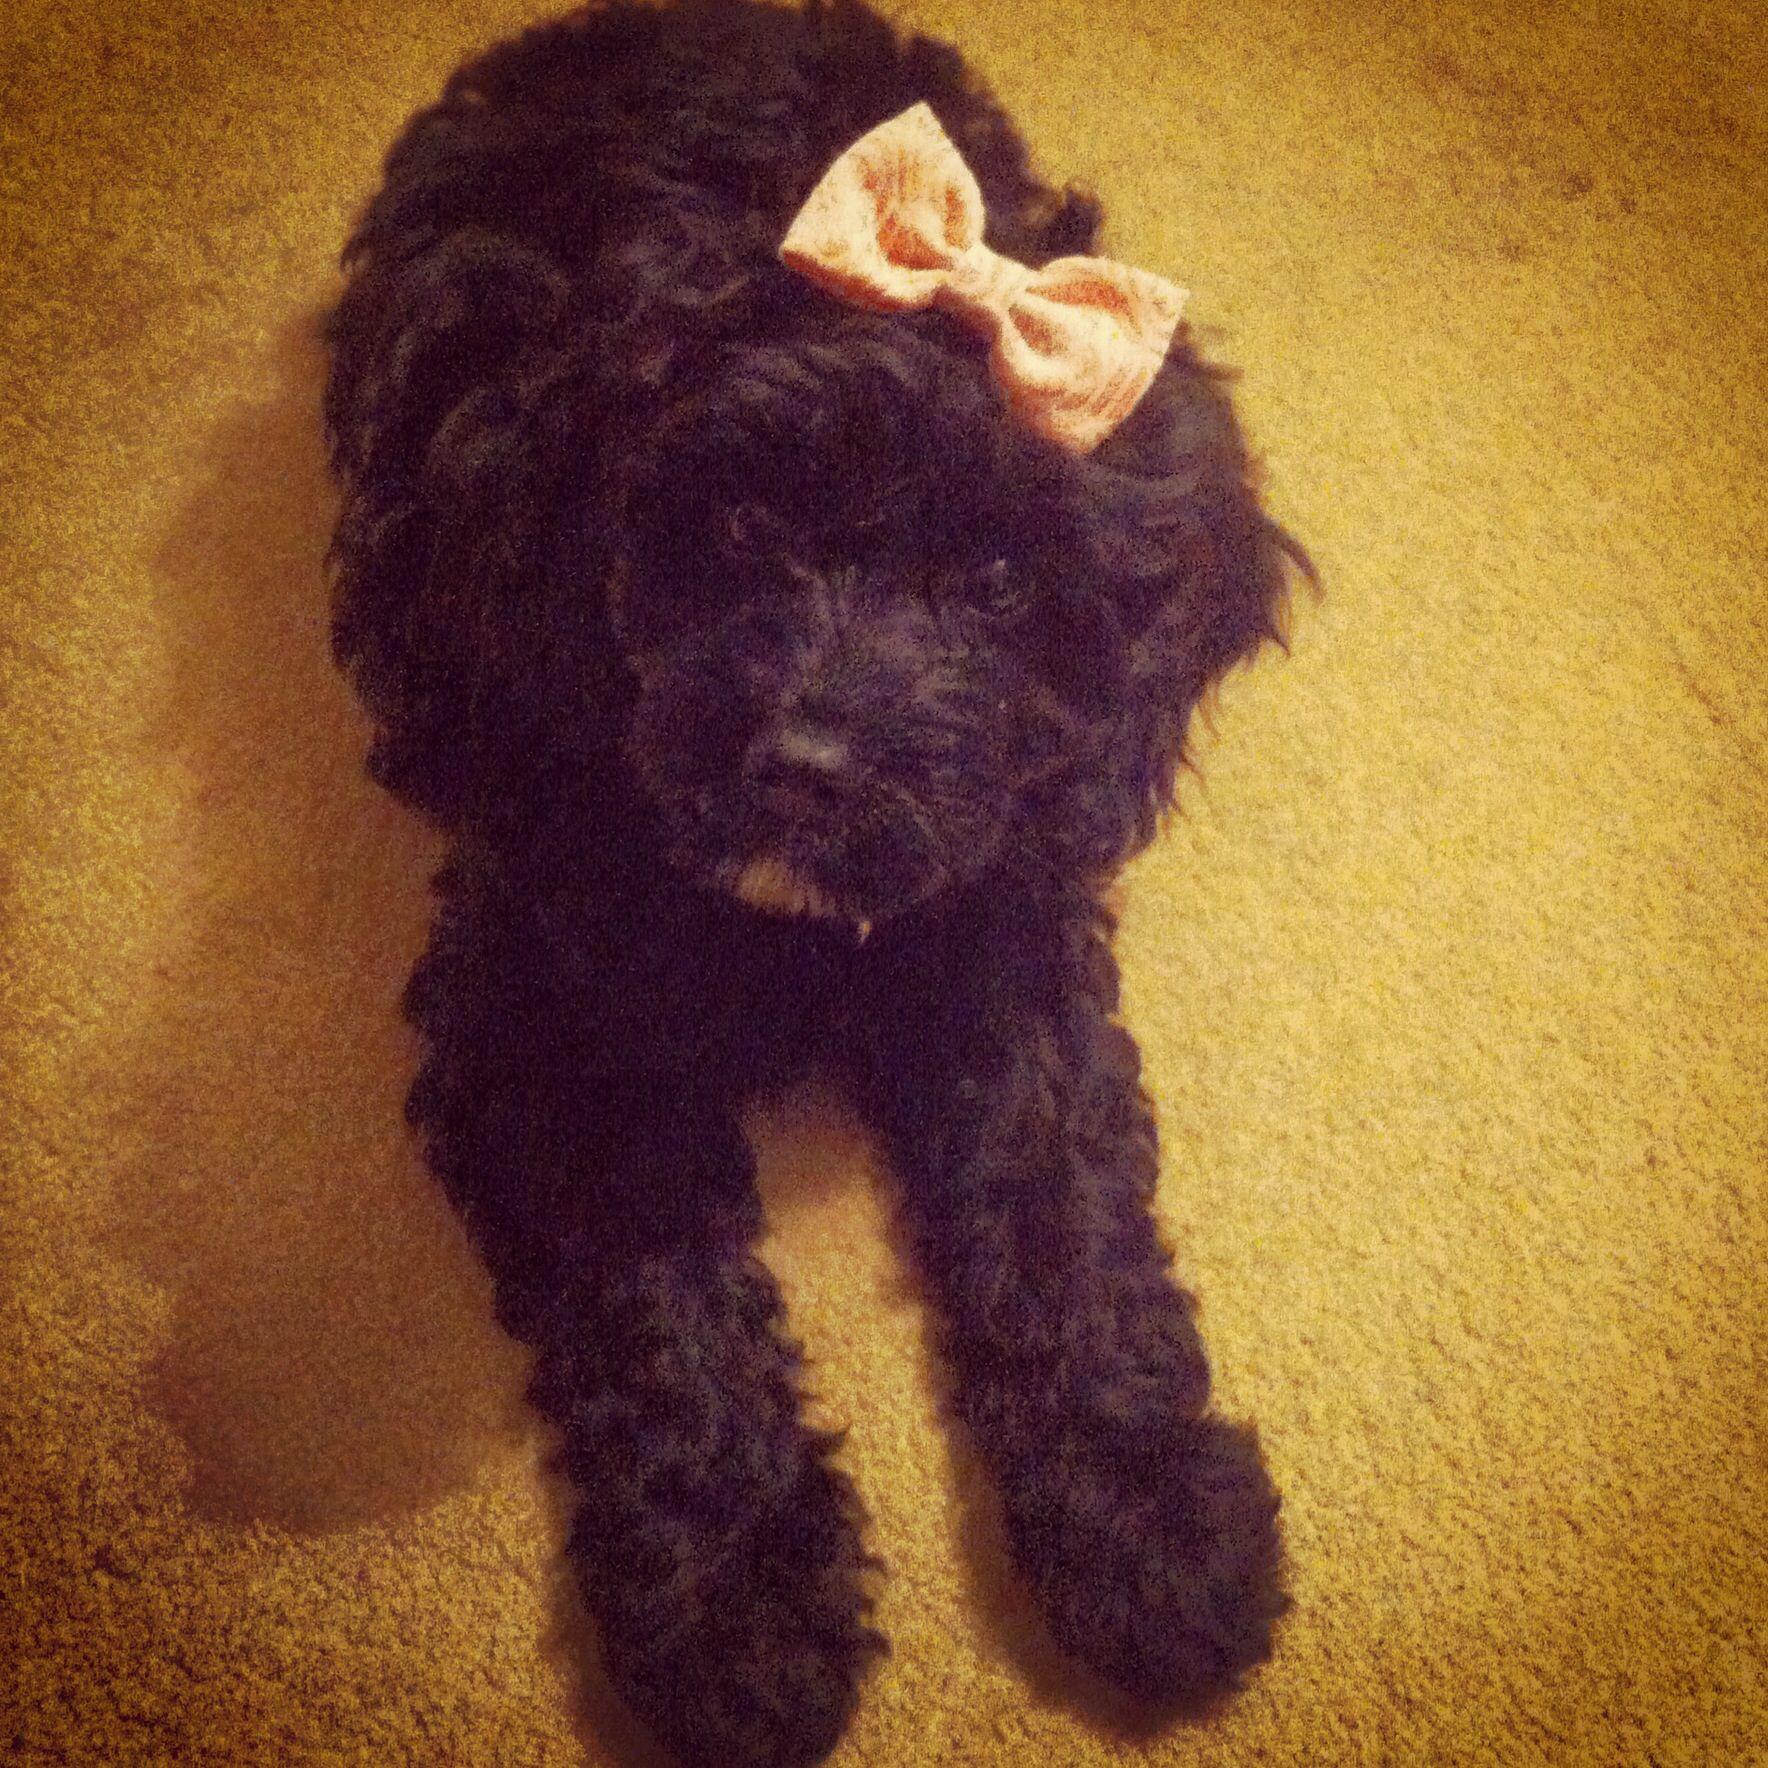 Coco my cavapoo puppy Cavapoo puppies, Puppies, Doggy